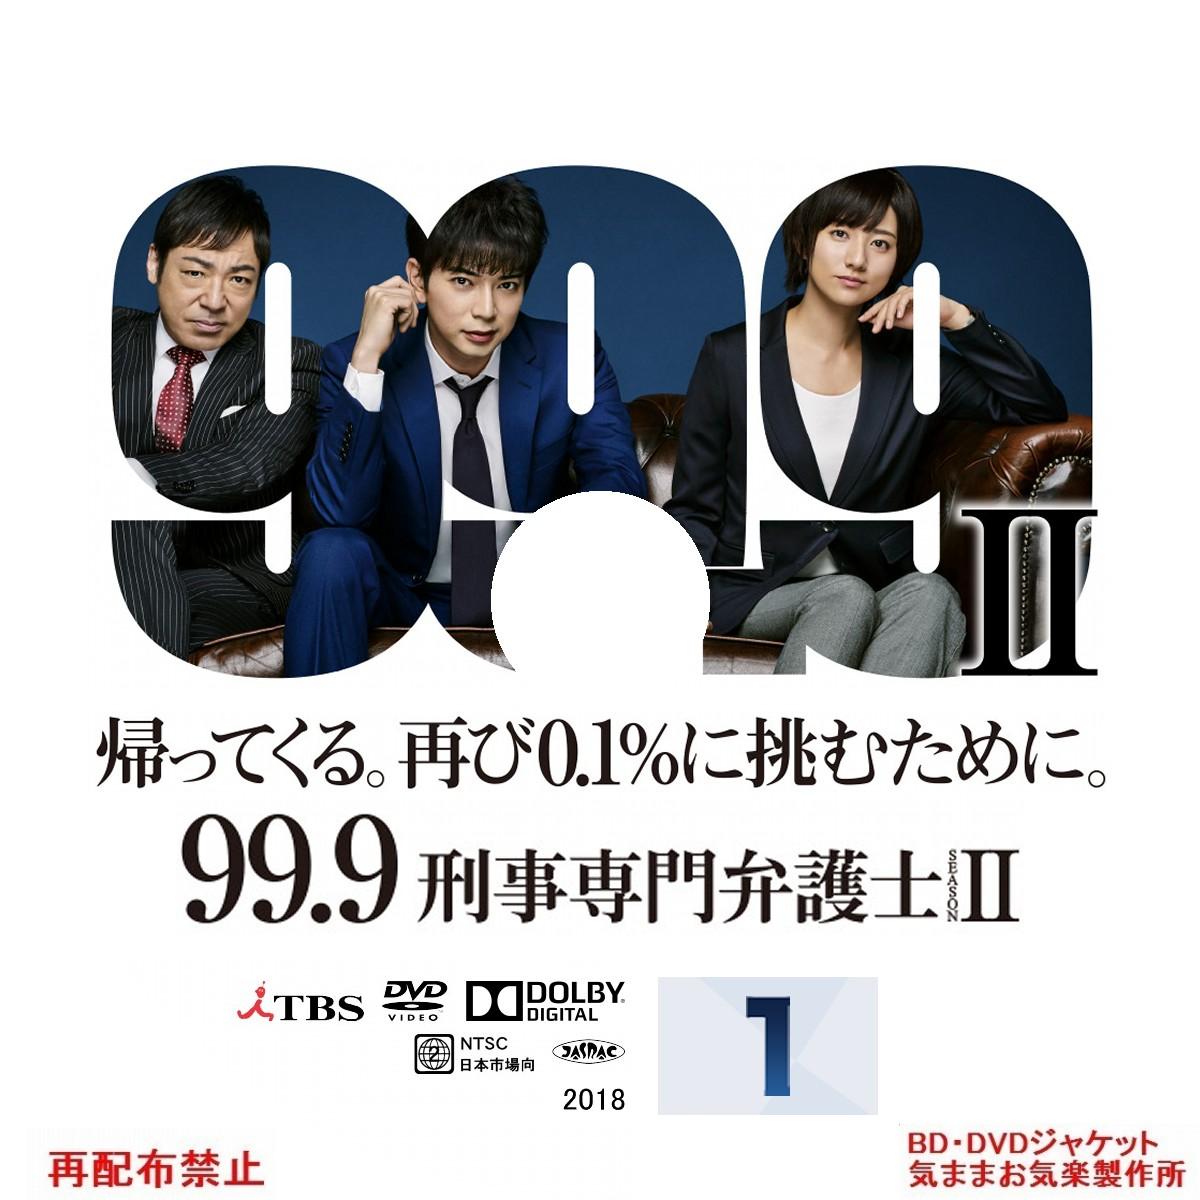 999_season2_DVD01.jpg